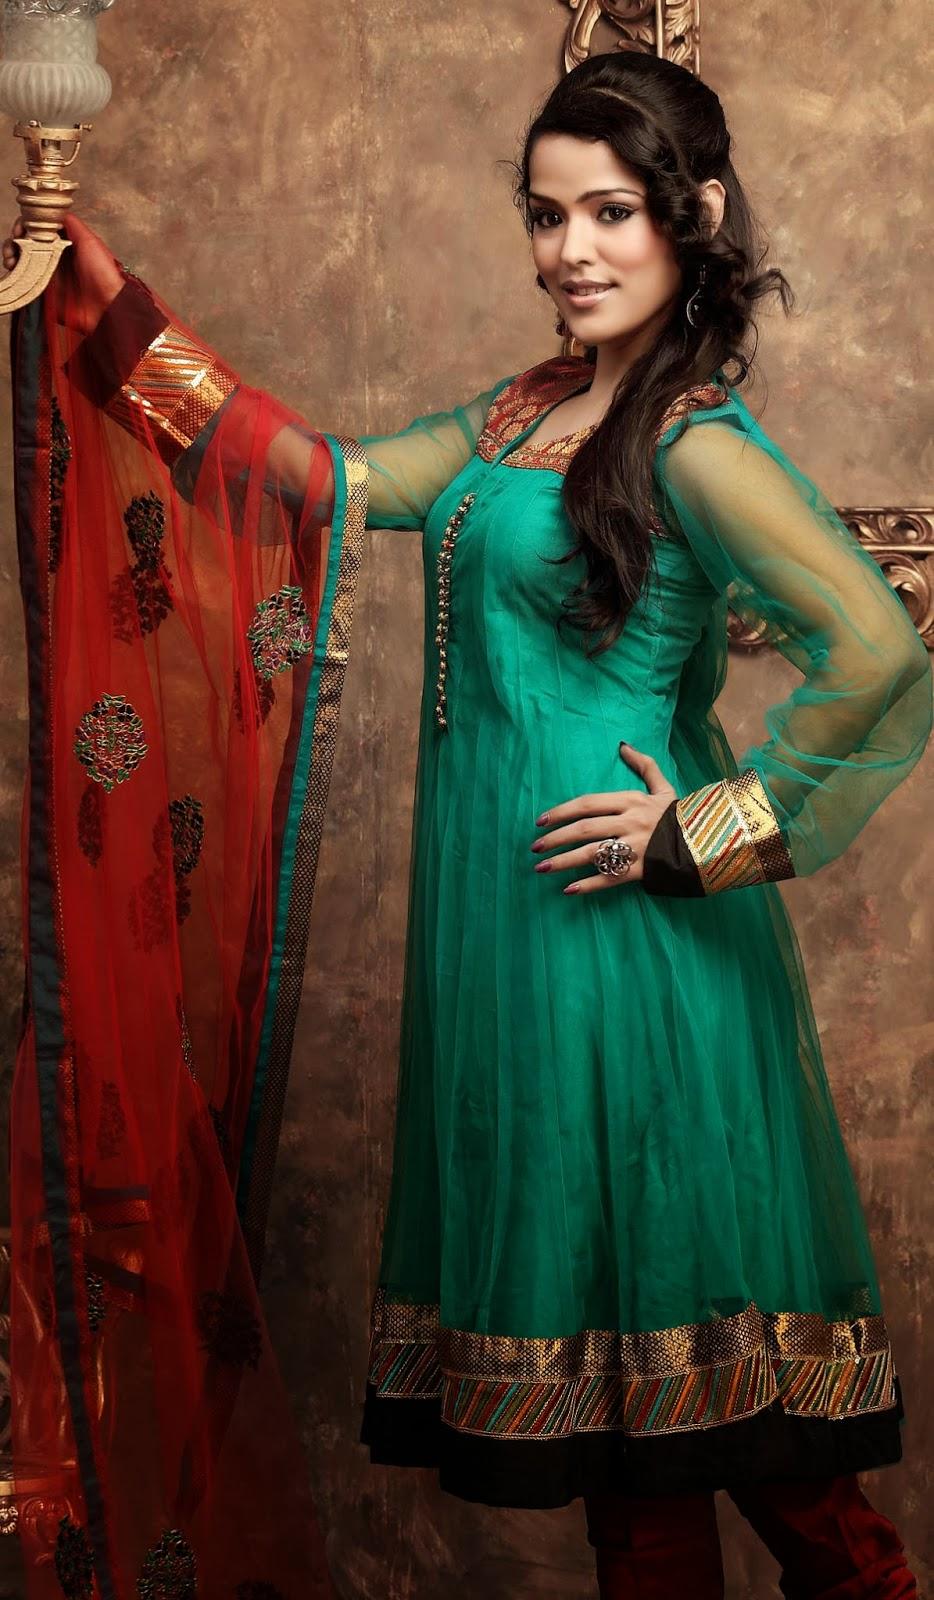 Punjabi Girl Salwar kameez HD Pictures Gallery #1 ...